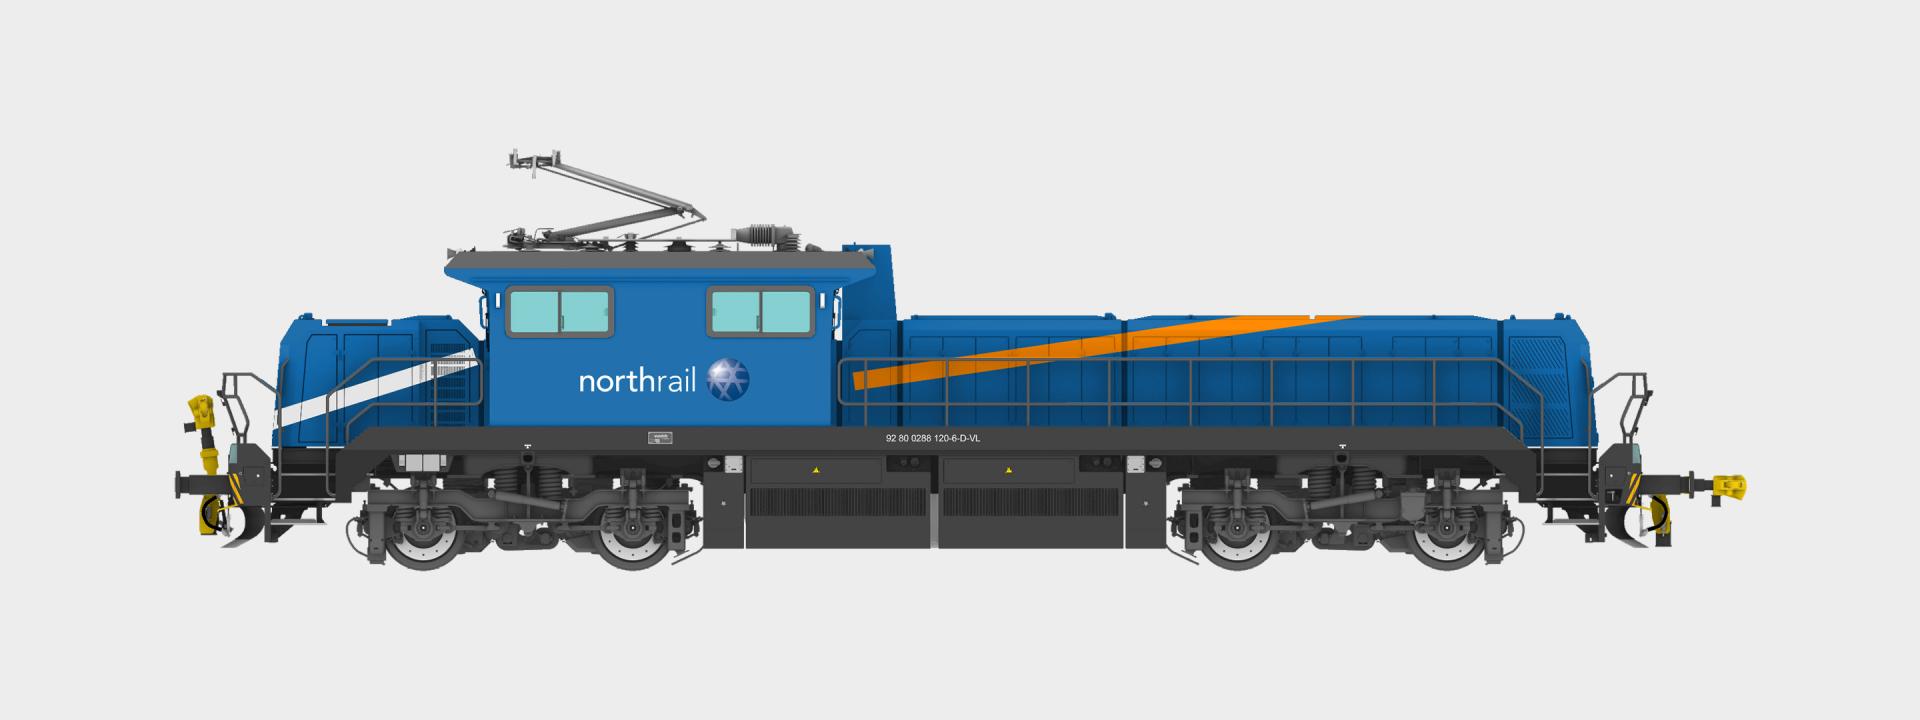 "Delivery of up to 50 ""zero-emission"" DM 20-EBB shunting and medium-haul locomotives"